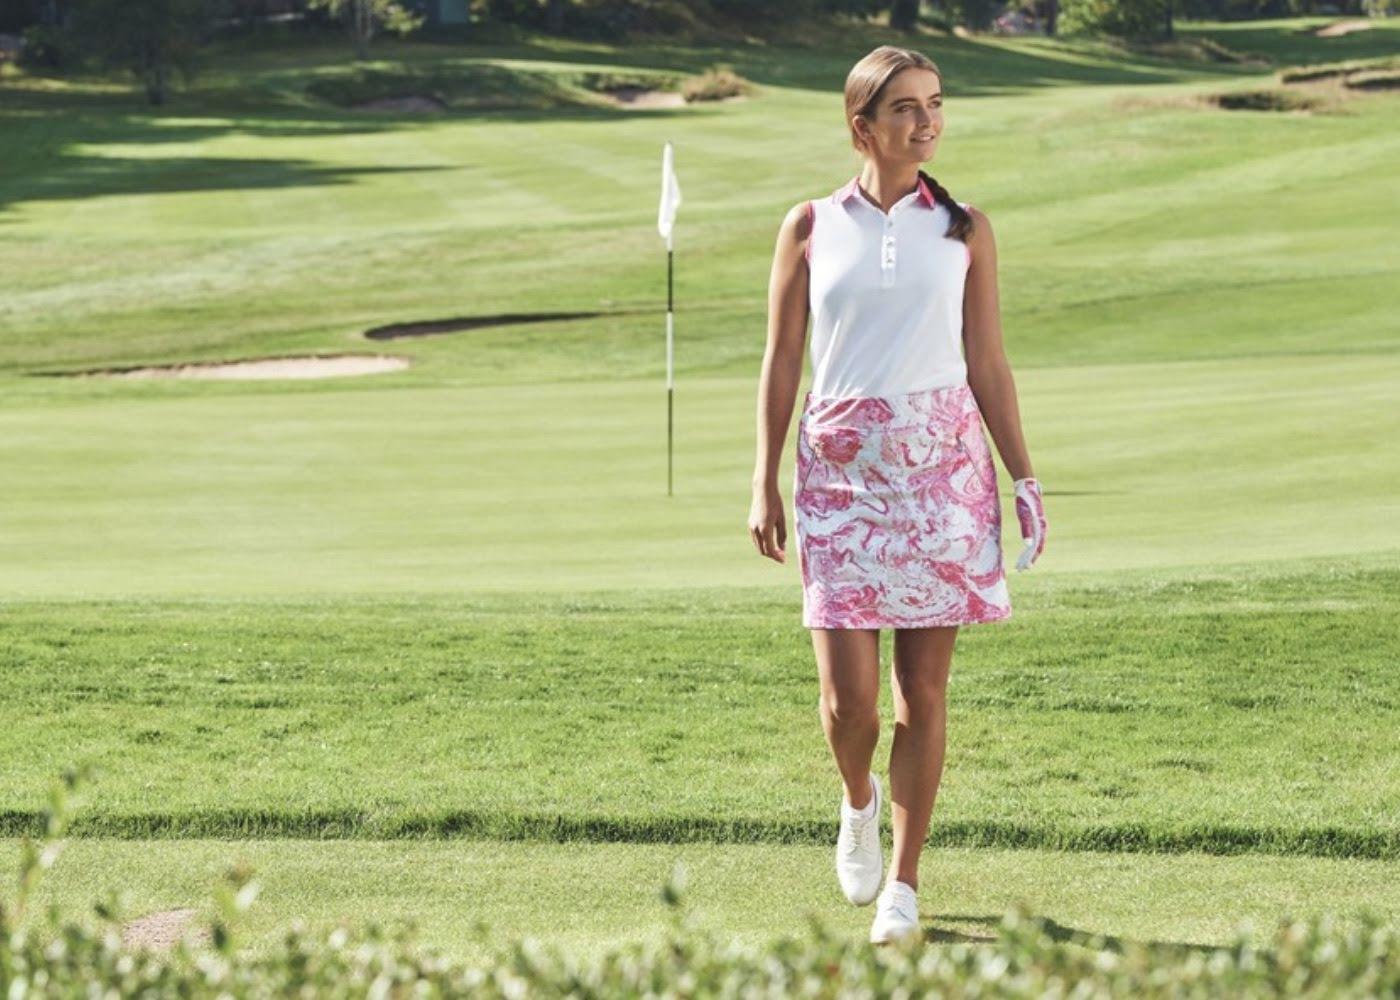 Golfkläder Daily Sports